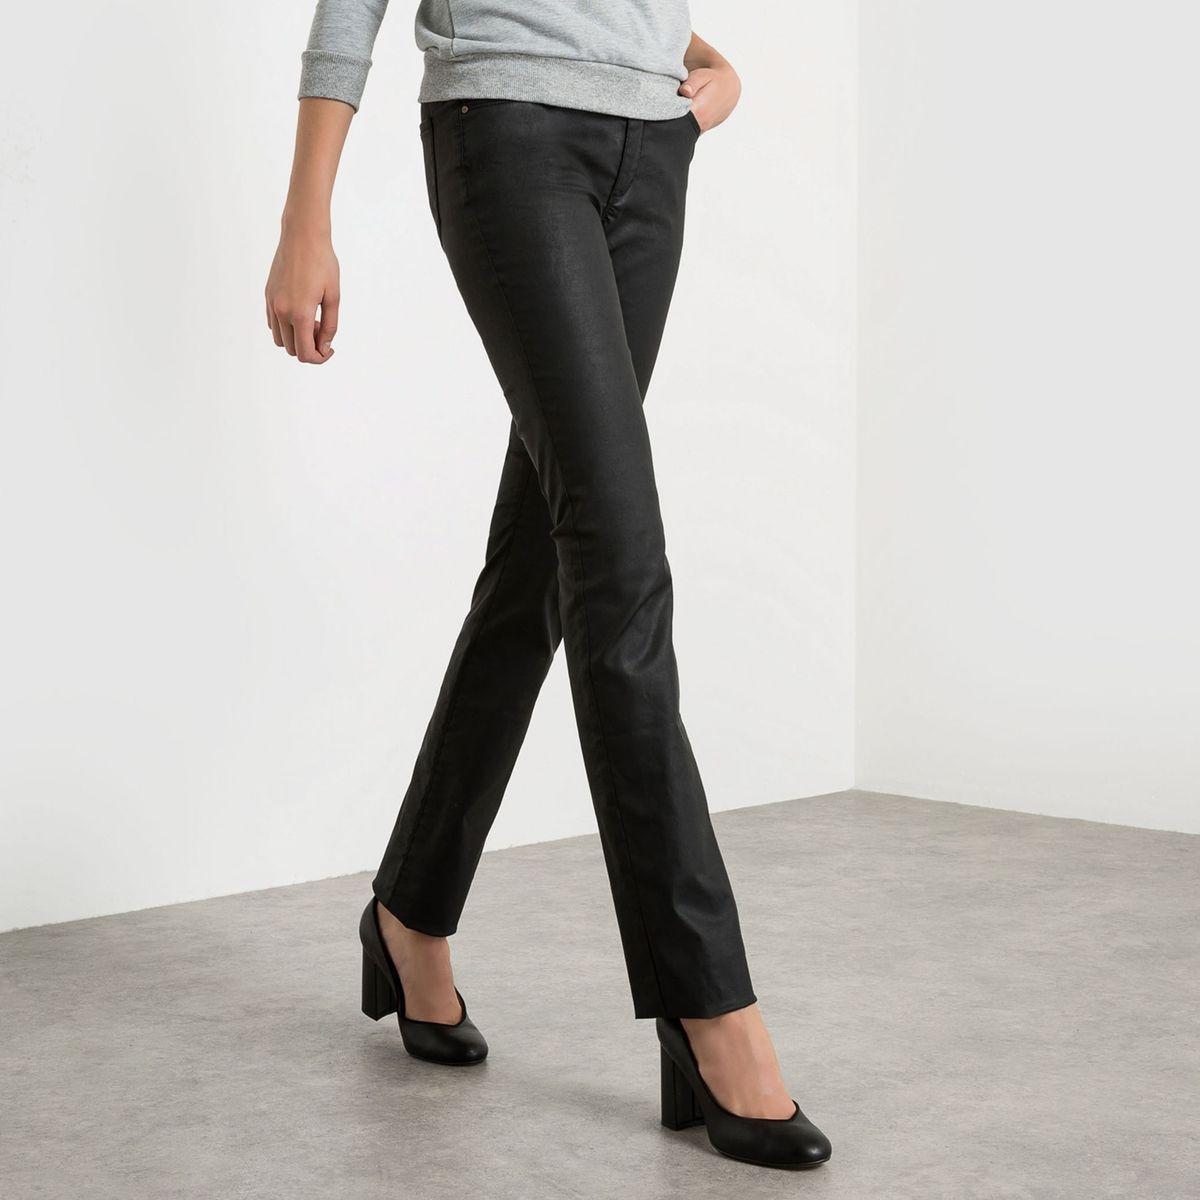 pantalon droit poches twill coton extensible 6bc09075702e